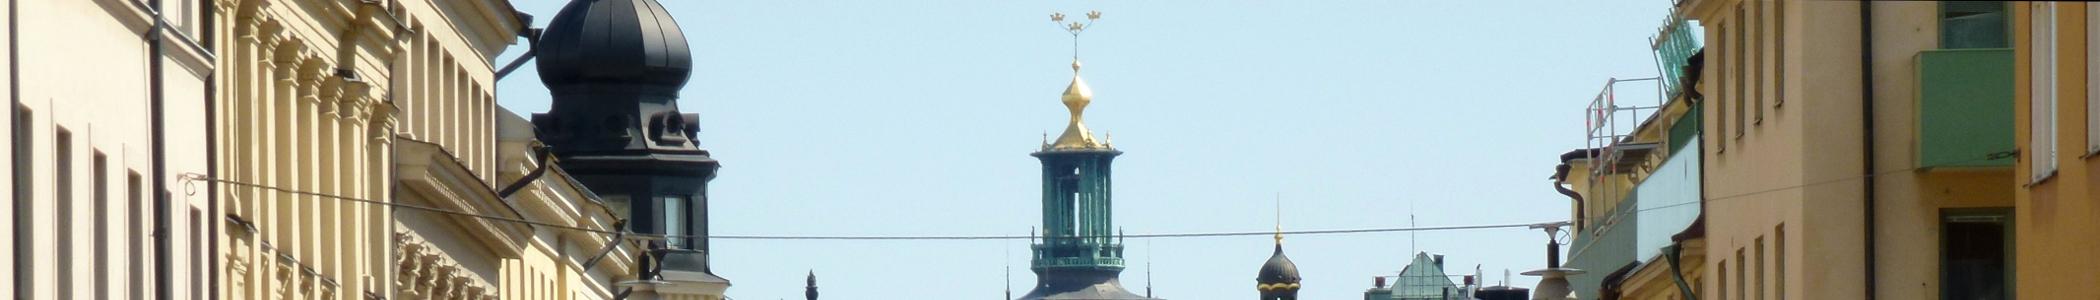 connect hotel city kungsholmen knulla uppsala